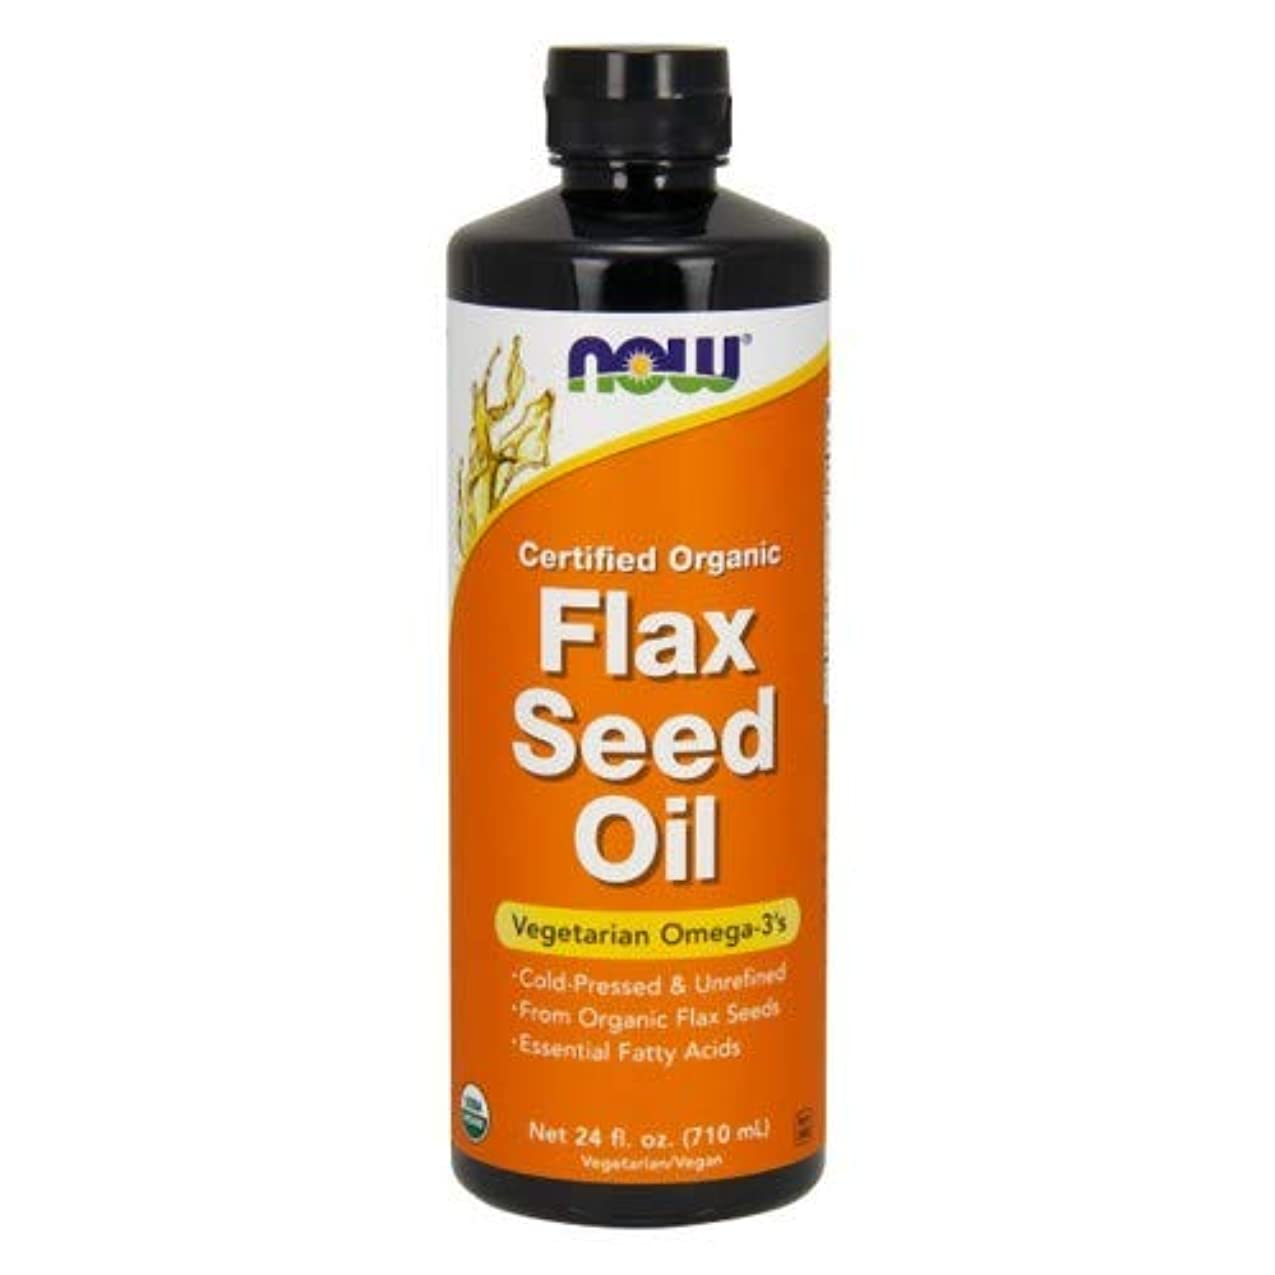 ご近所変換論争Flax Seed Oil (Certified Organic) 24